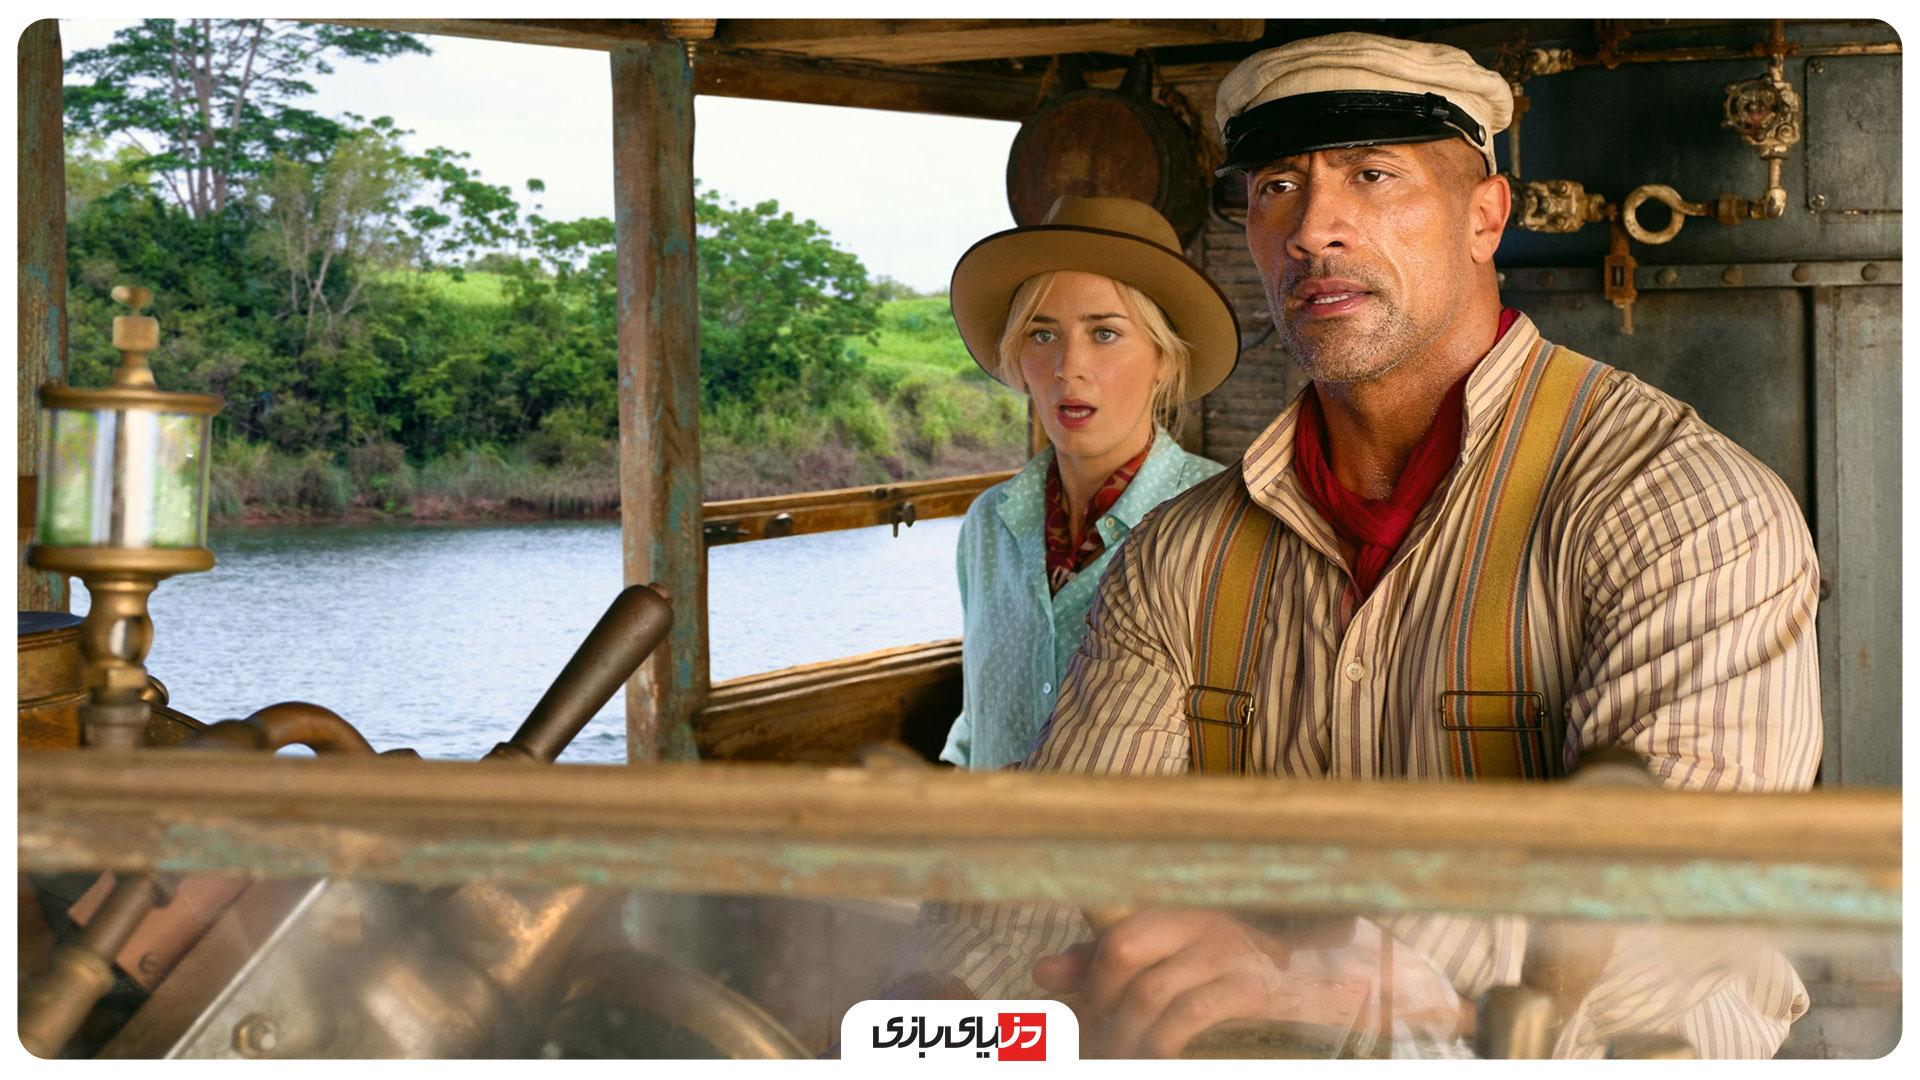 بررسی فیلم Jungle Cruise